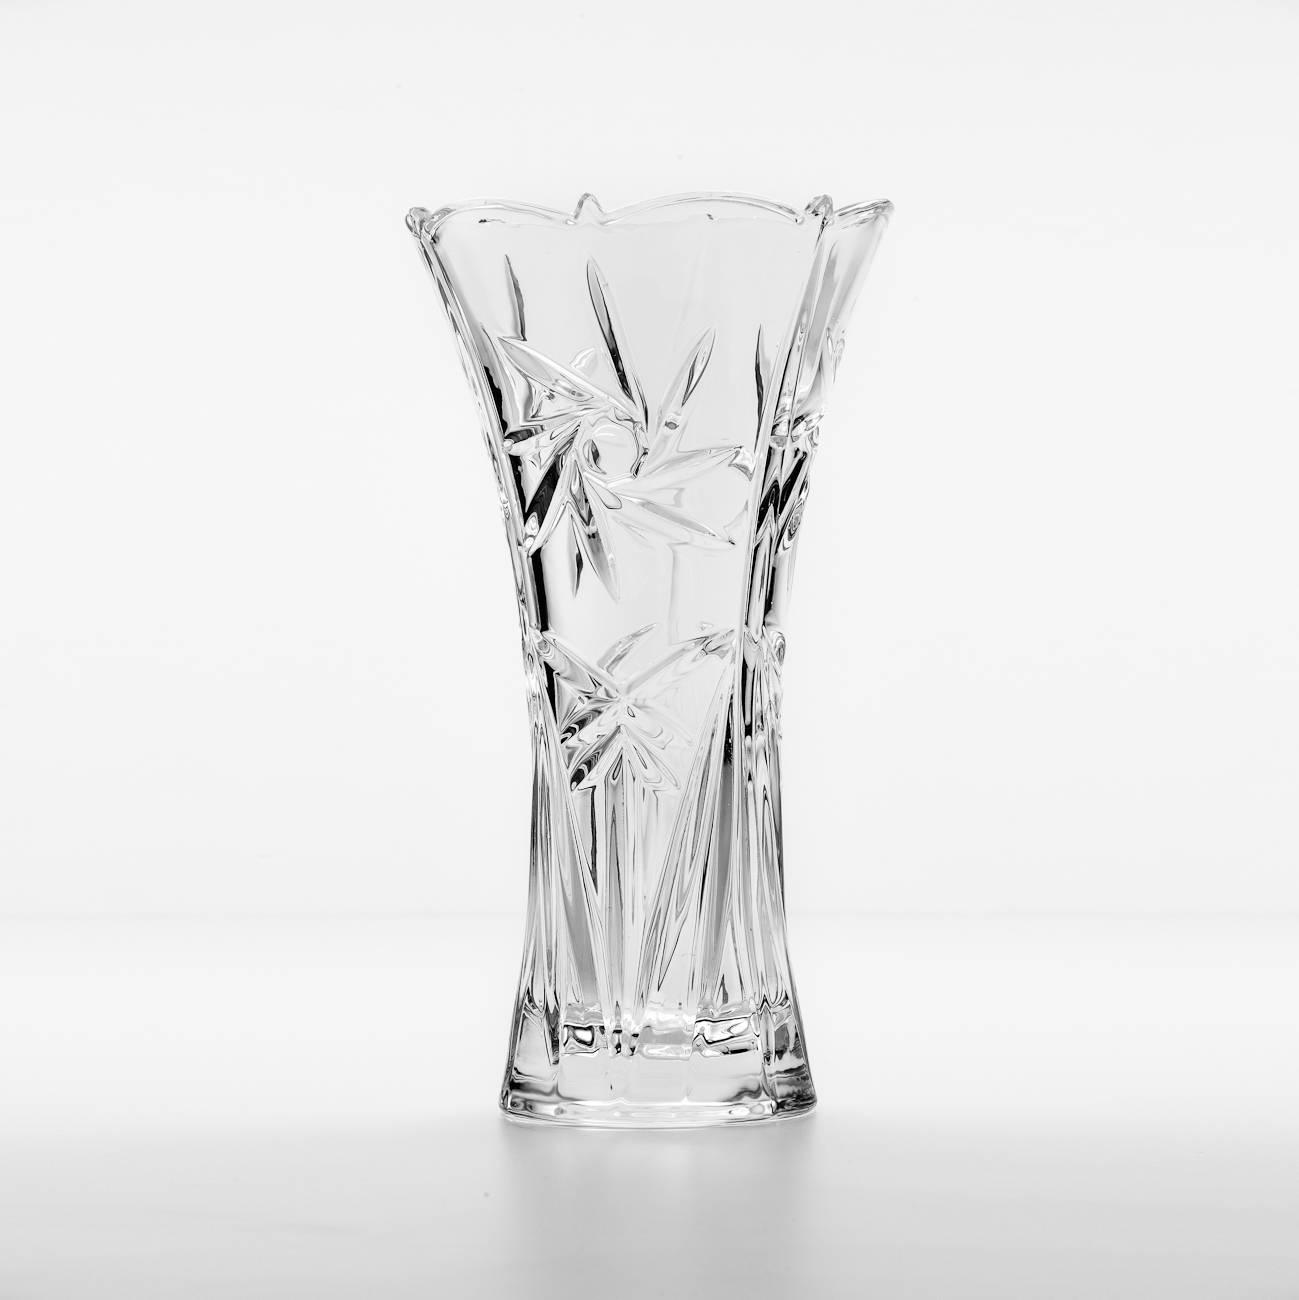 Vaso Orion c/ Relevo em Cristal - Wolff - 35 cm